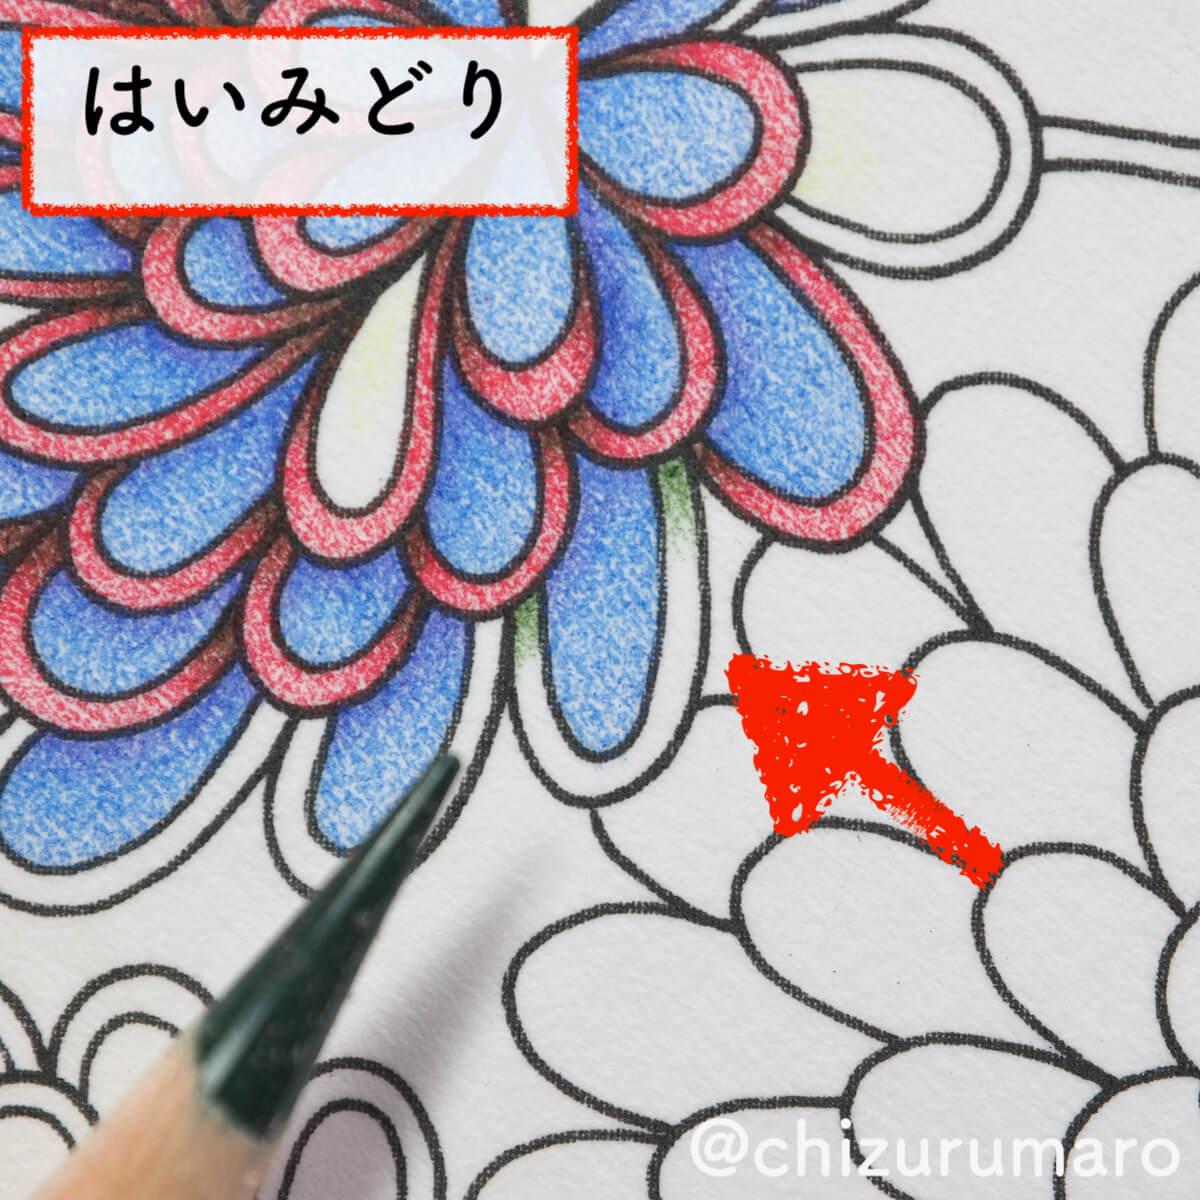 f:id:chizurumaro:20200404111129j:plain